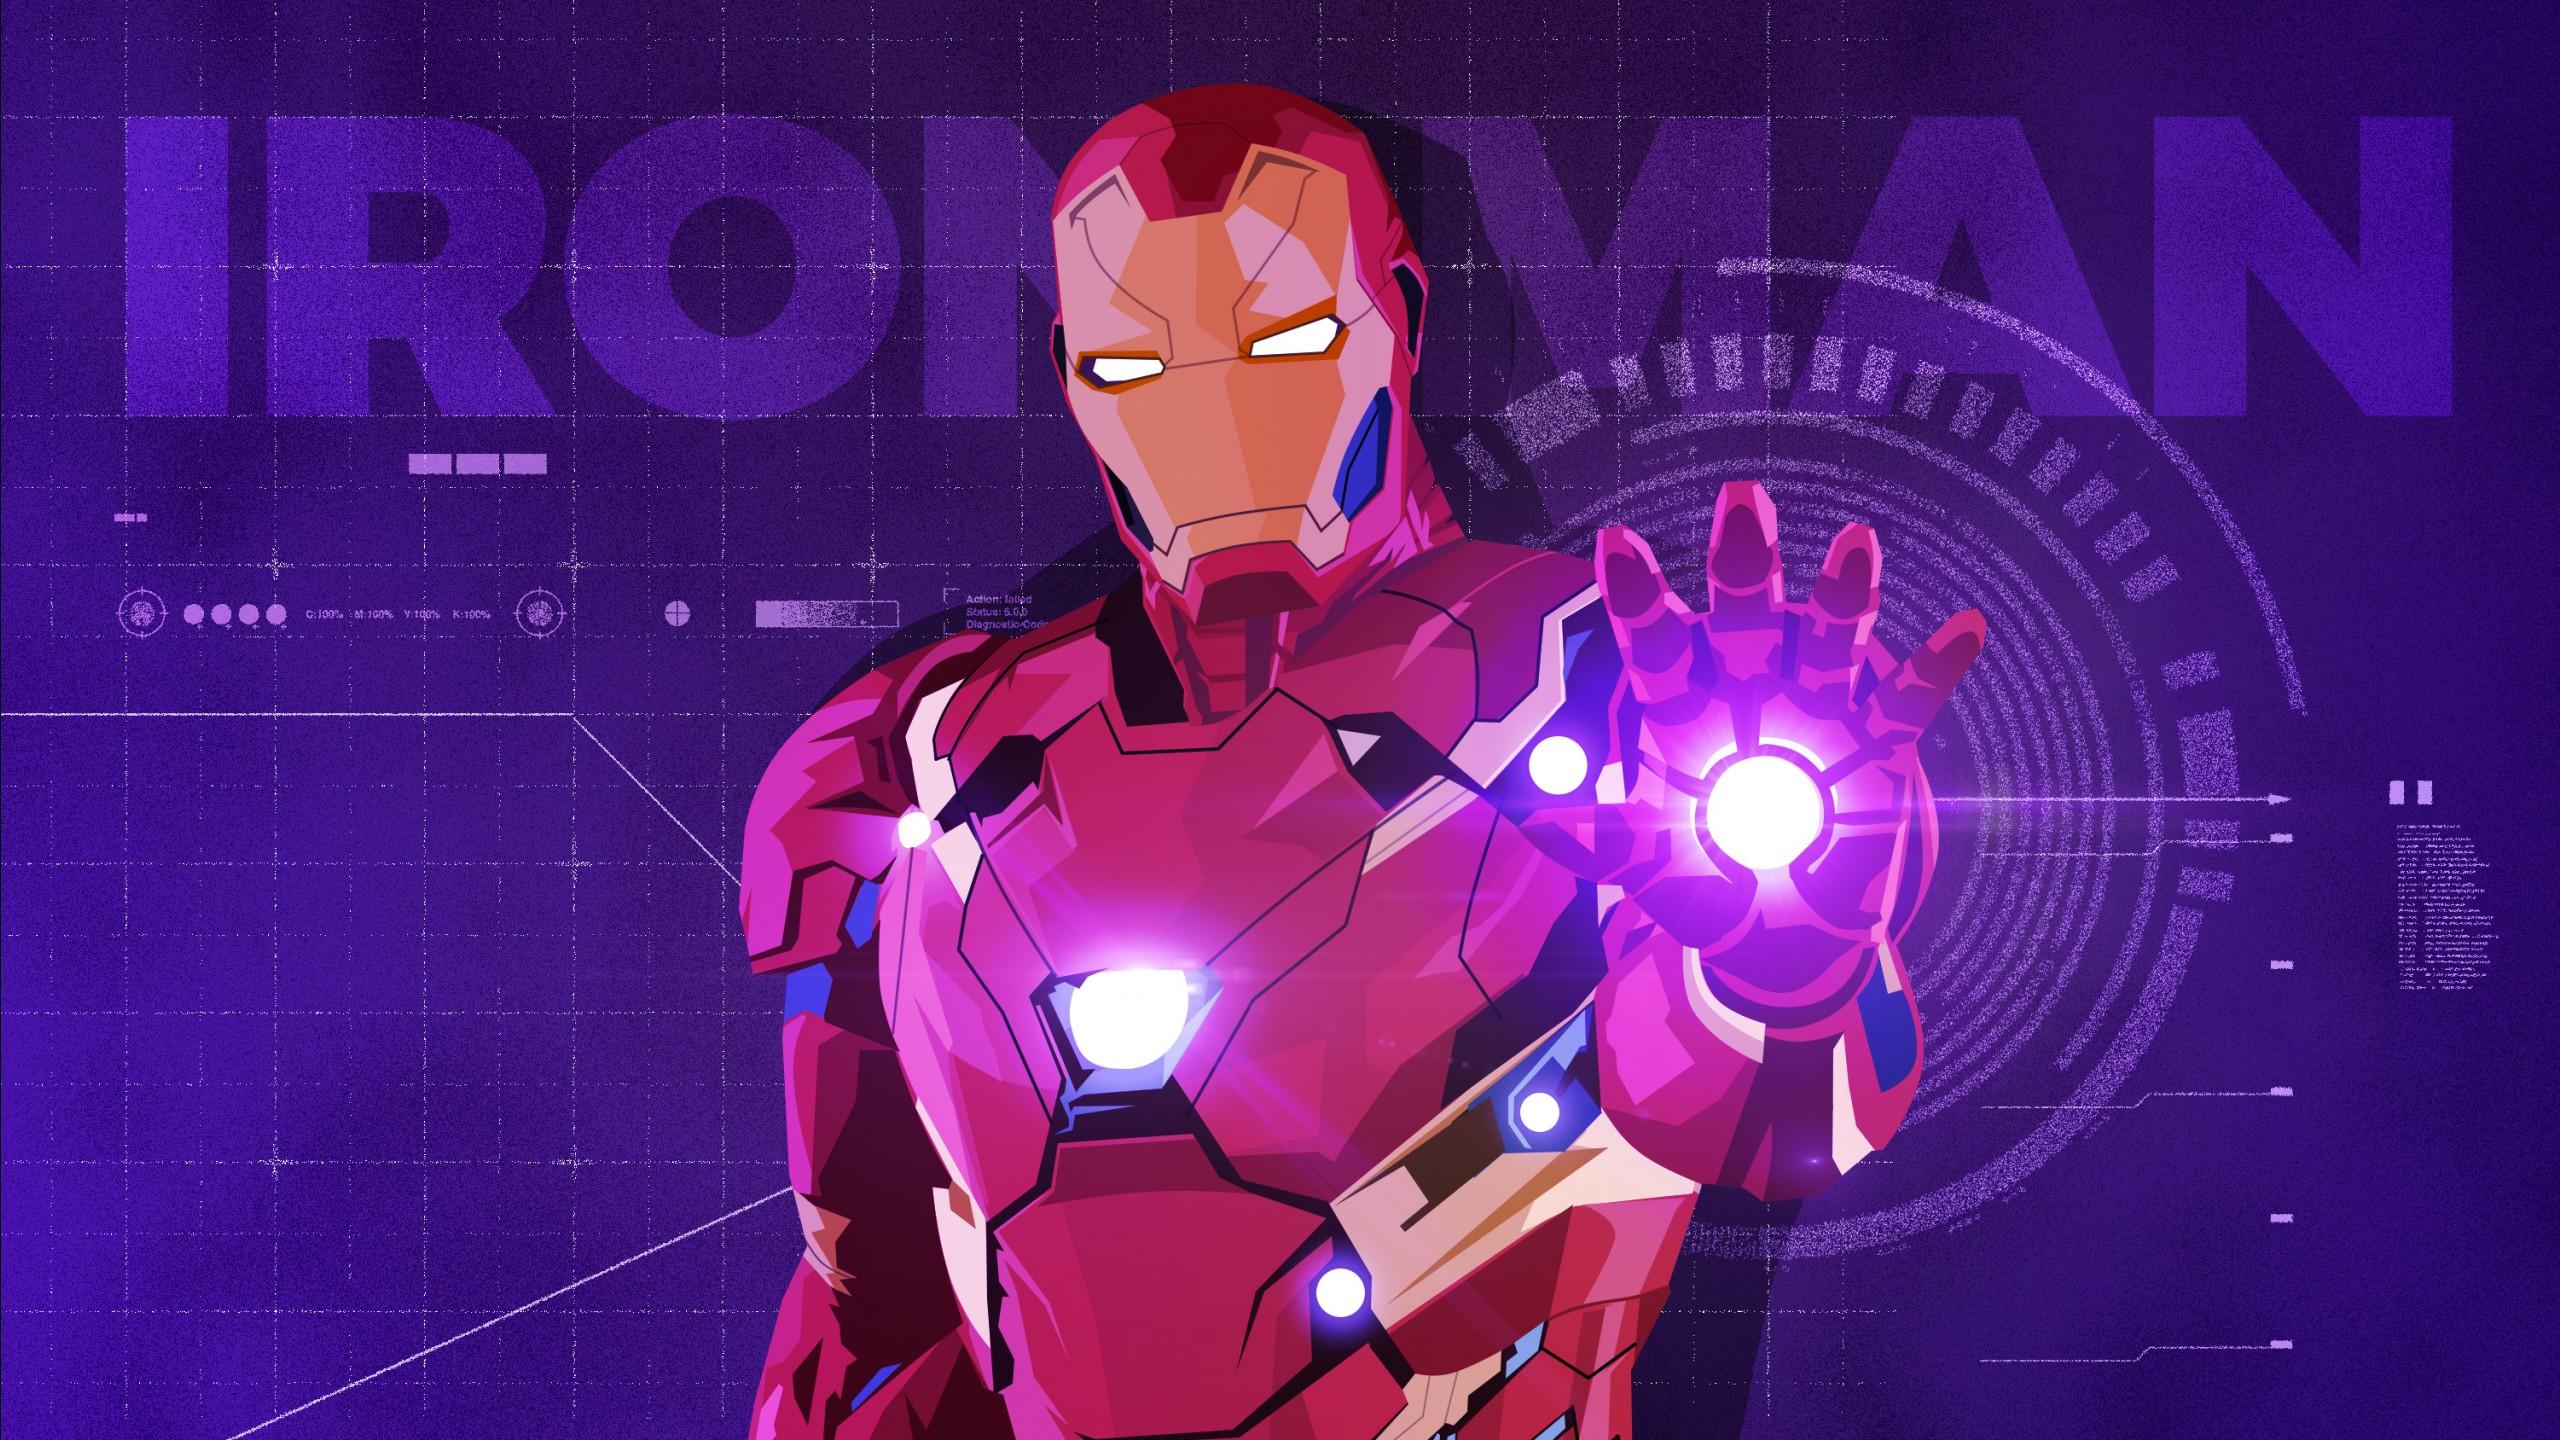 Iron Man 3d Wallpaper Download Iron Man Hd Wallpapers Hd Wallpapers Id 21982